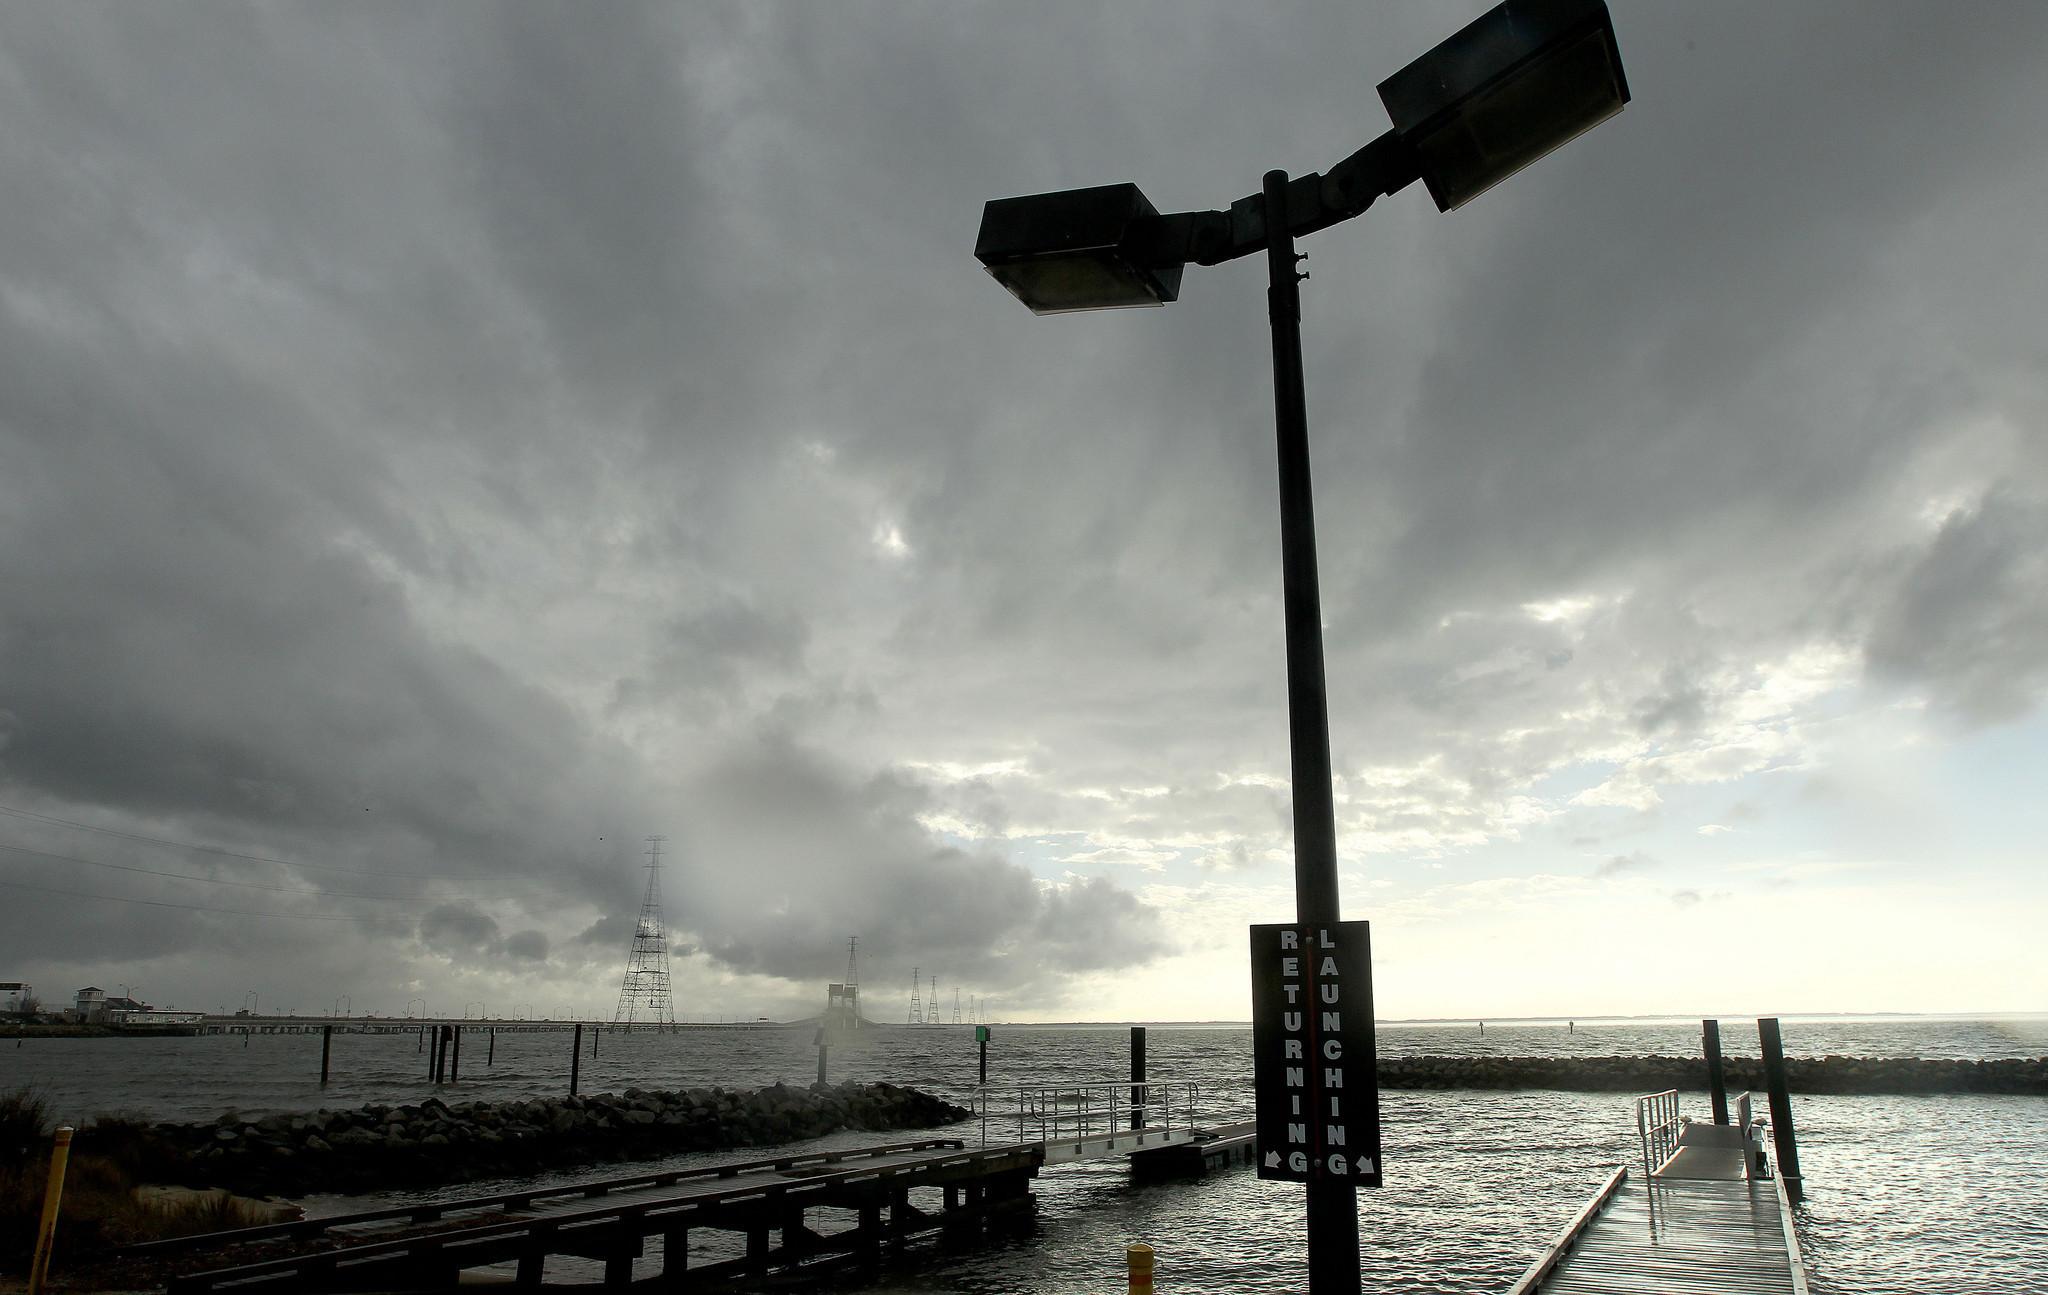 Weather Tornado Warning Lifted Region Under Tornado